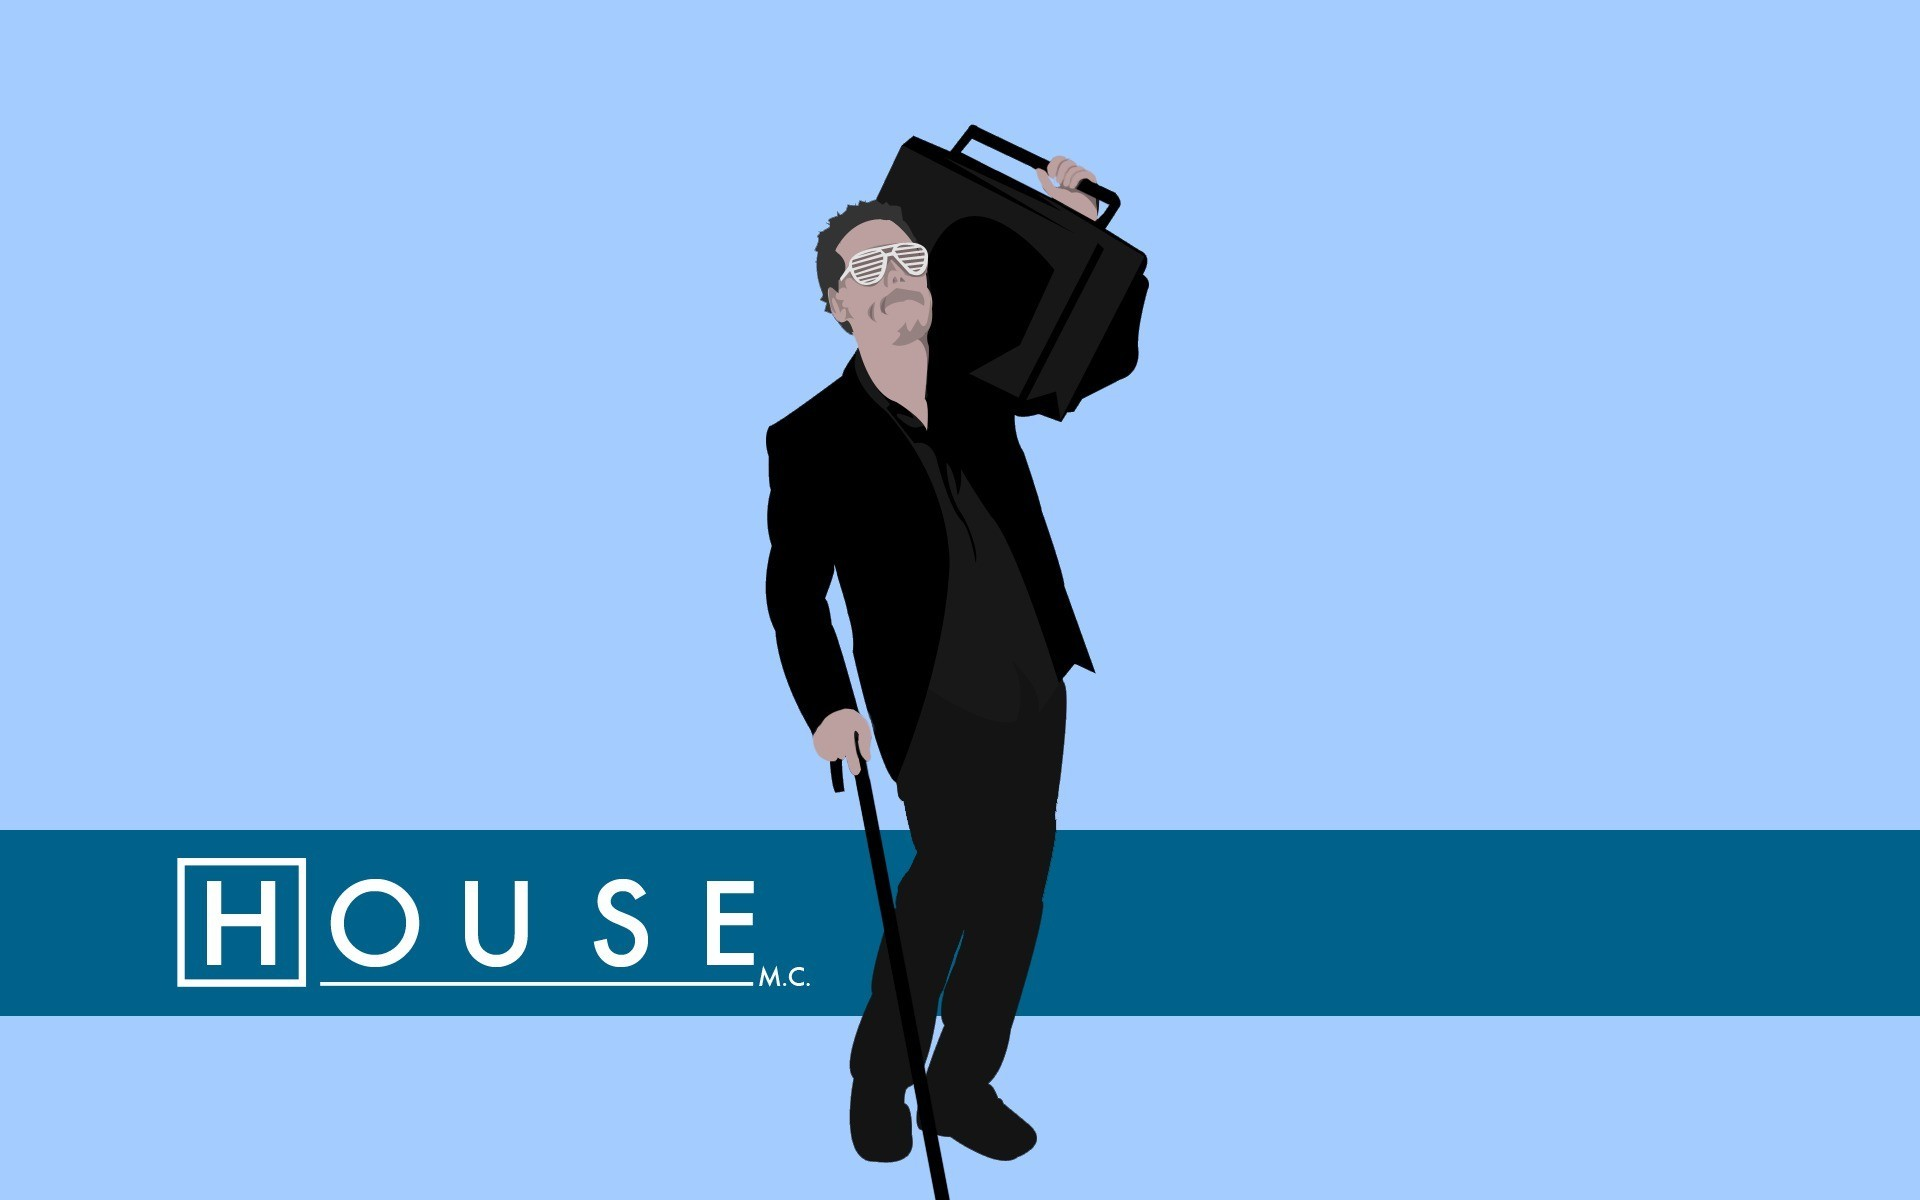 TV, Humor, House, M.D. Wallpaper HD